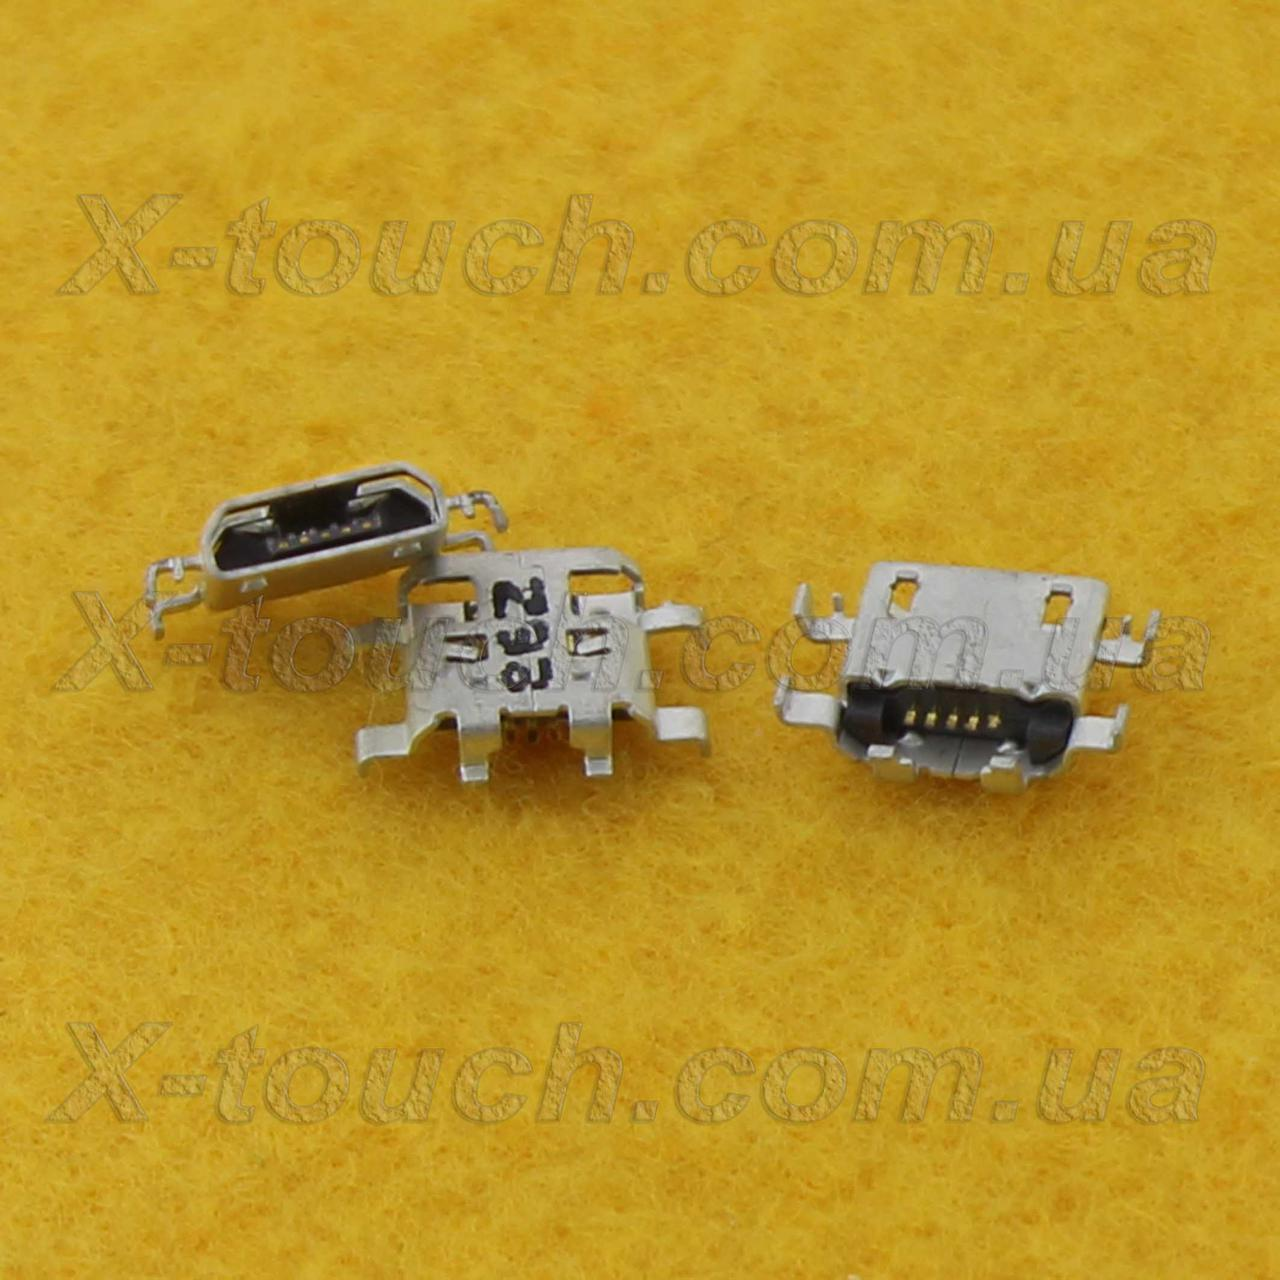 Sony Xperia M2 D2305 разъем зарядки micro-B USB 5pin.